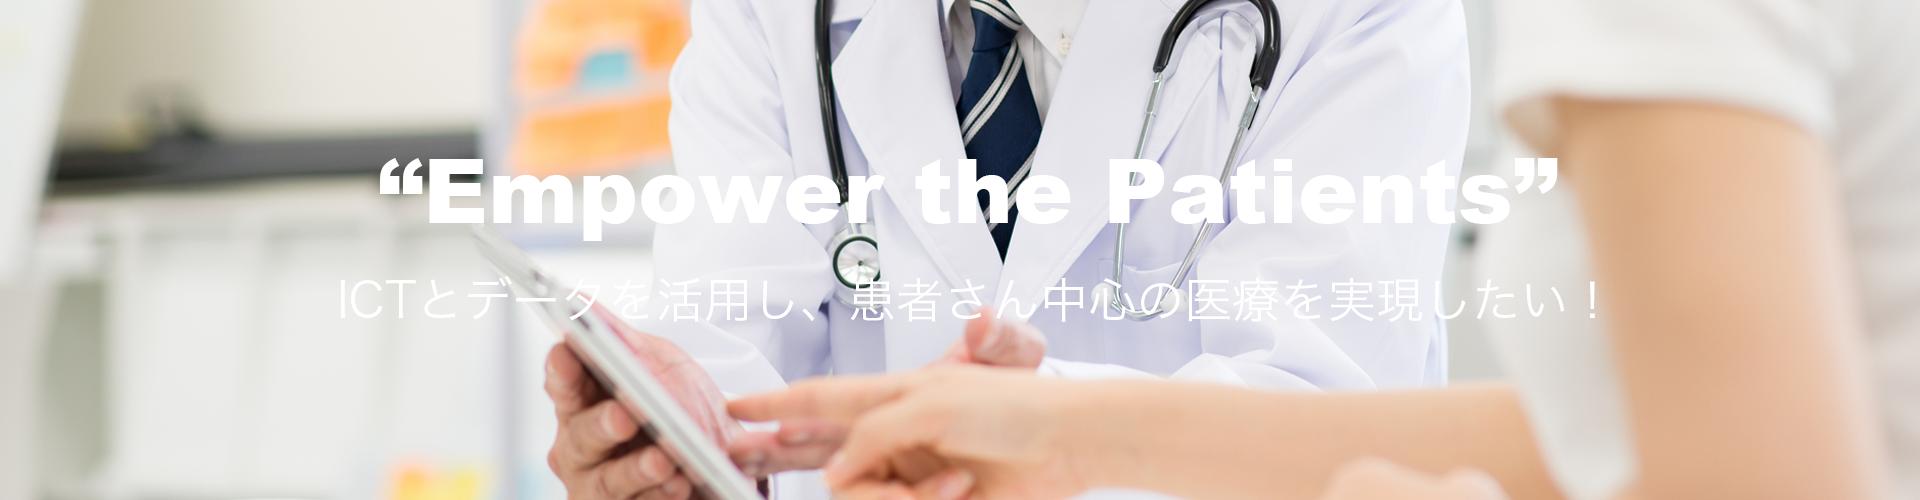 Welbyでは、「医療×IT」で「日本の医療」を変えていきたいという想いの仲間を探しています!